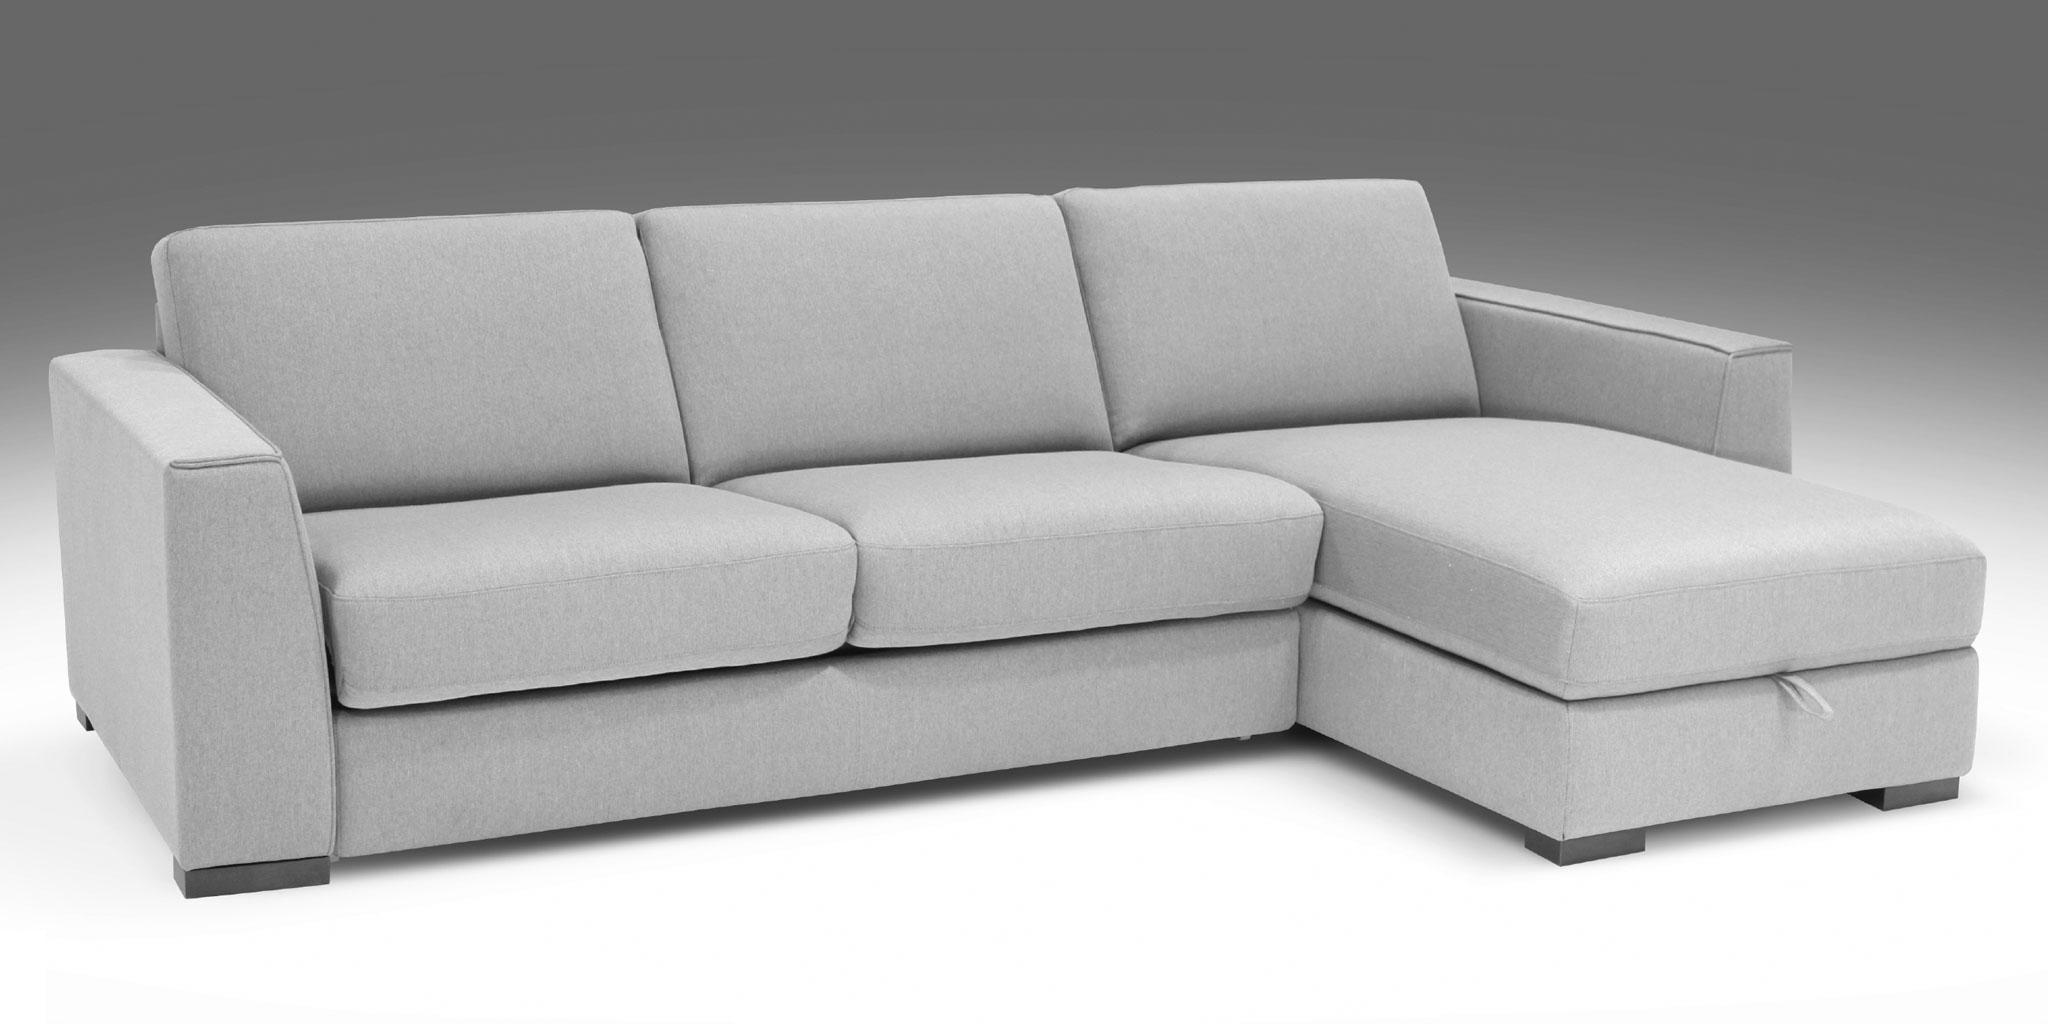 Lisbon Sofa Bed